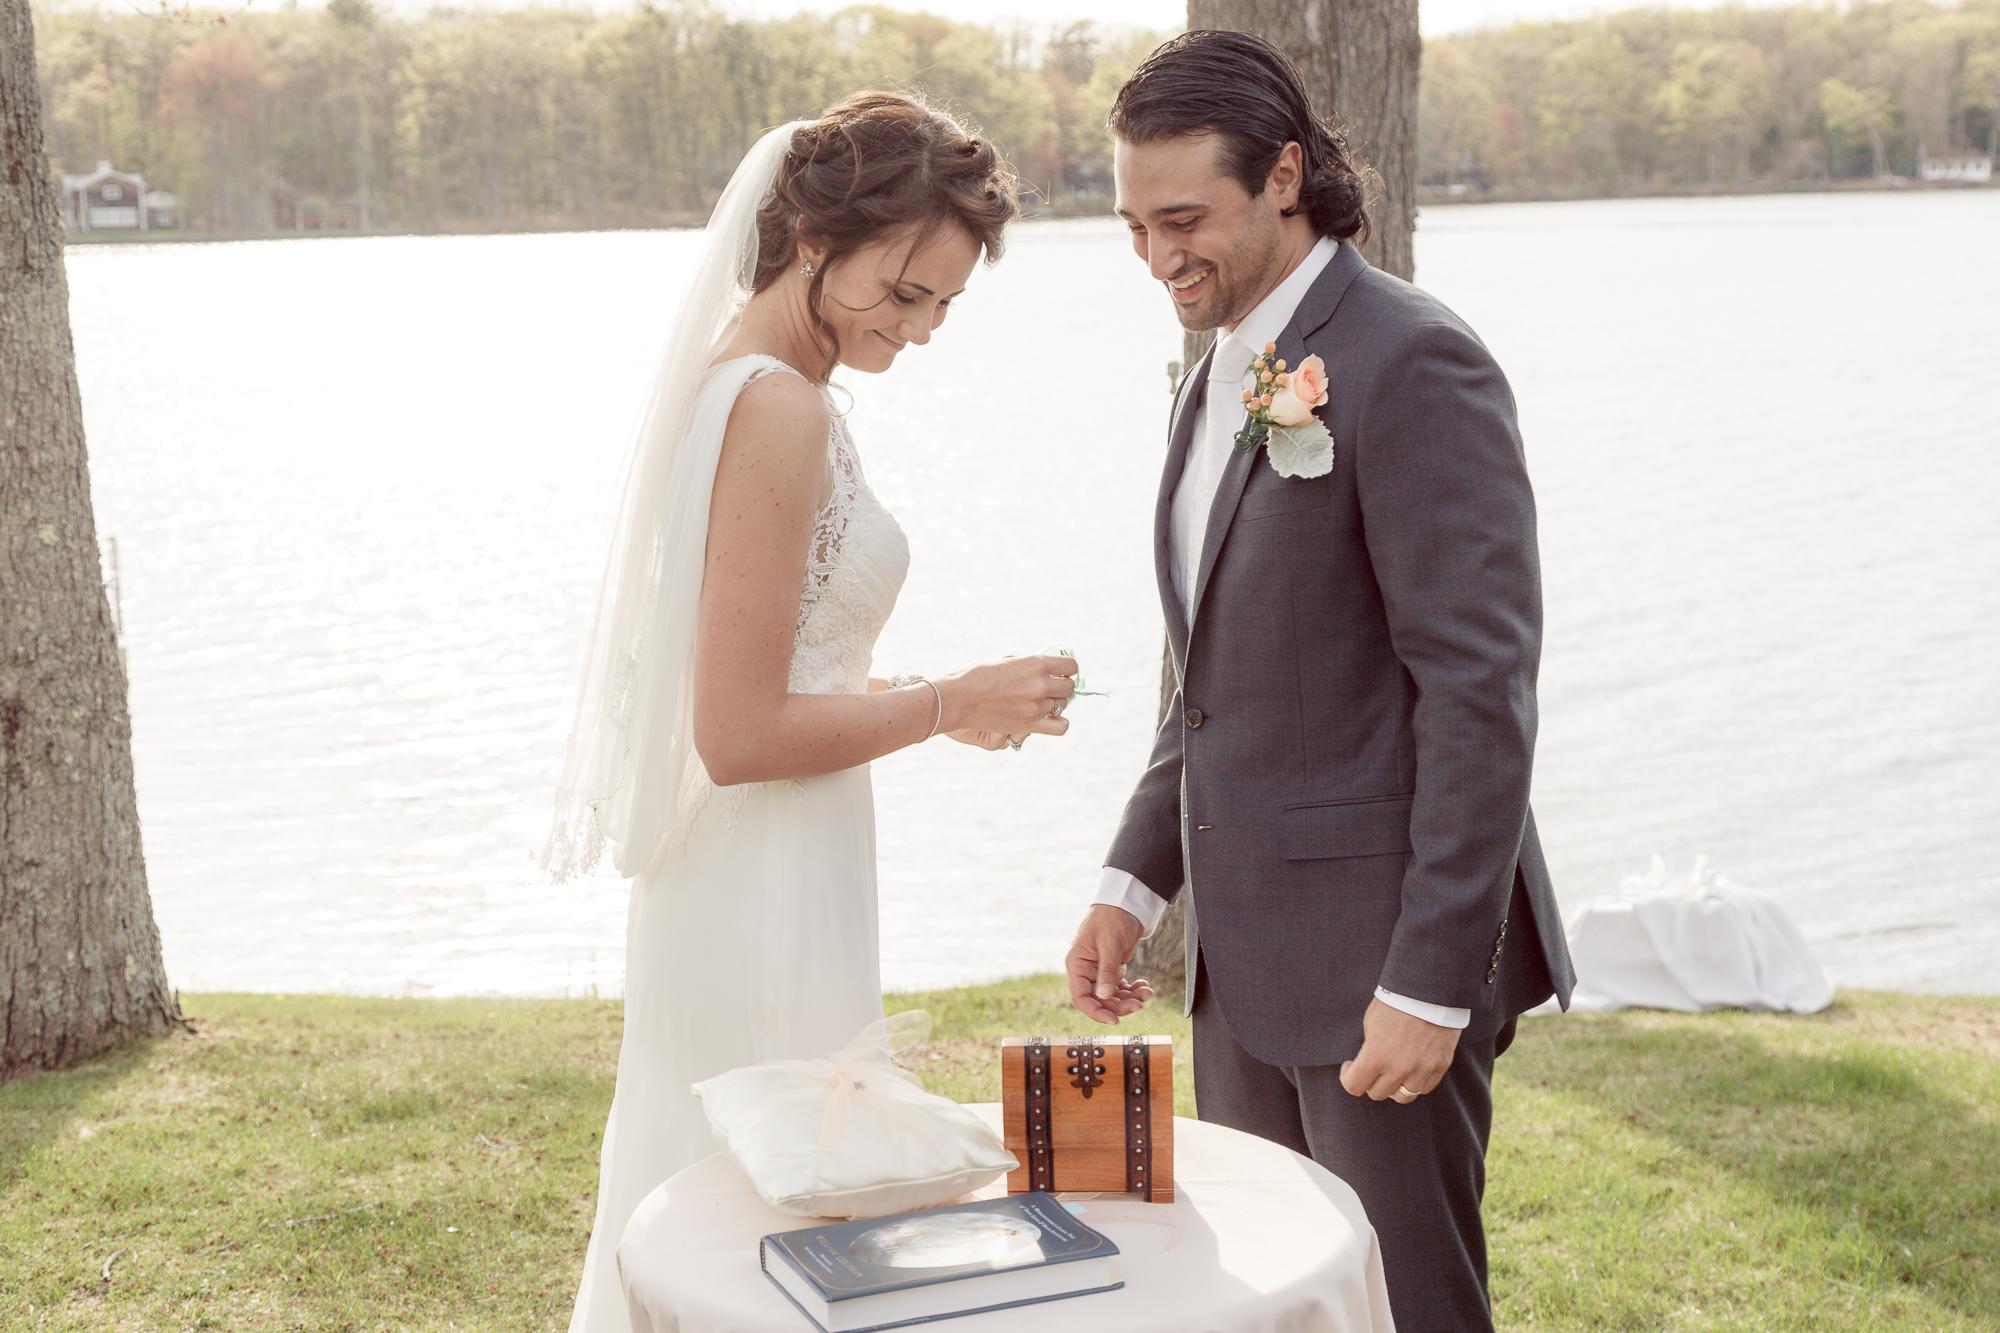 scranton-wedding-photography-zak-zavada-poconos--mattRachel-033.jpg